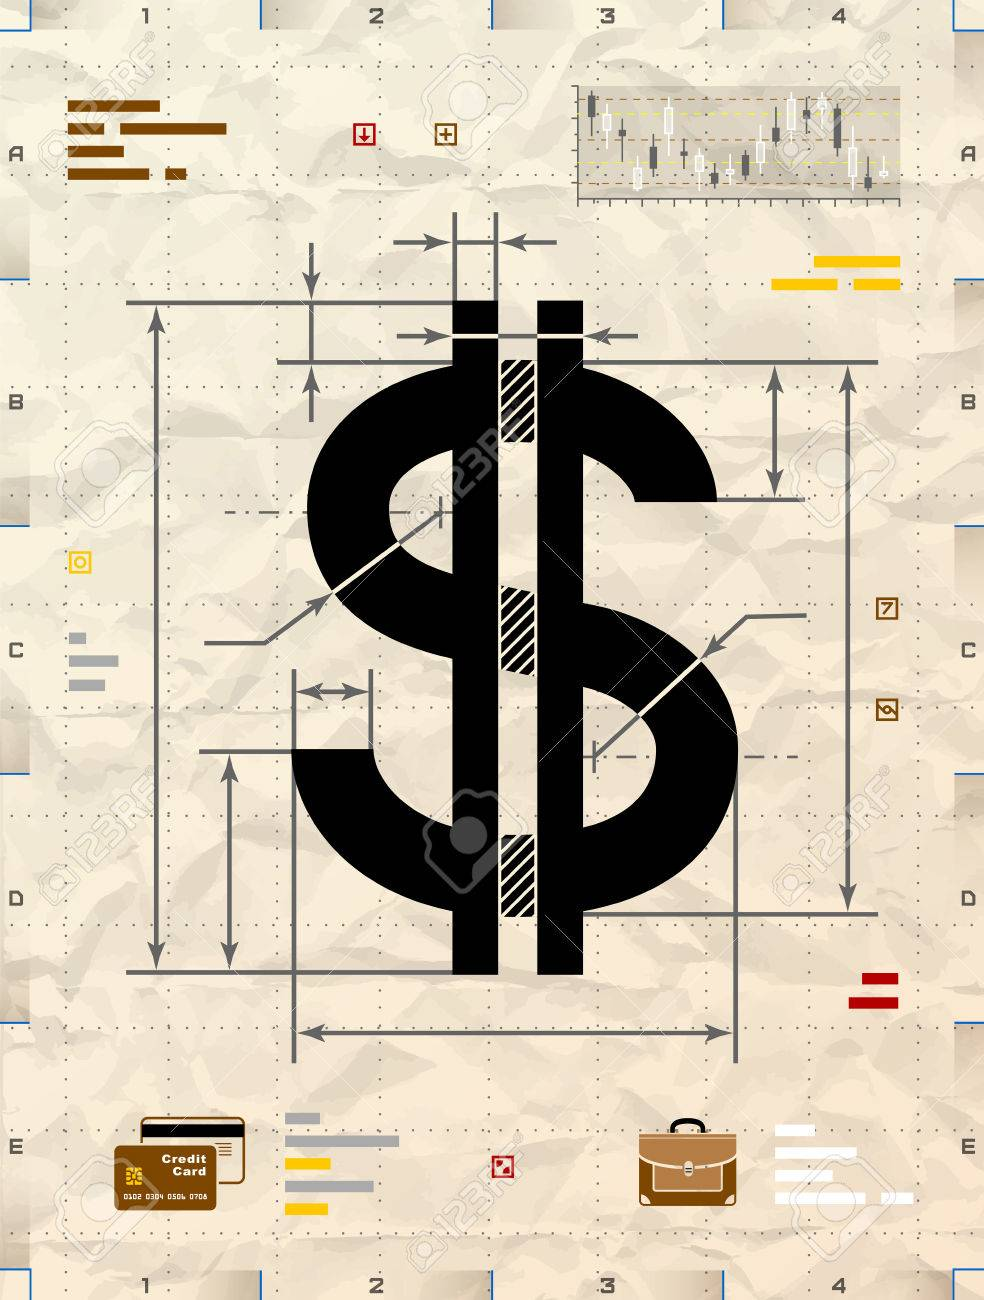 Money Sign Drawing : money, drawing, Dollar, Technical, Blueprint, Drawing., Drafting, Money.., Royalty, Cliparts,, Vectors,, Stock, Illustration., Image, 51043782.